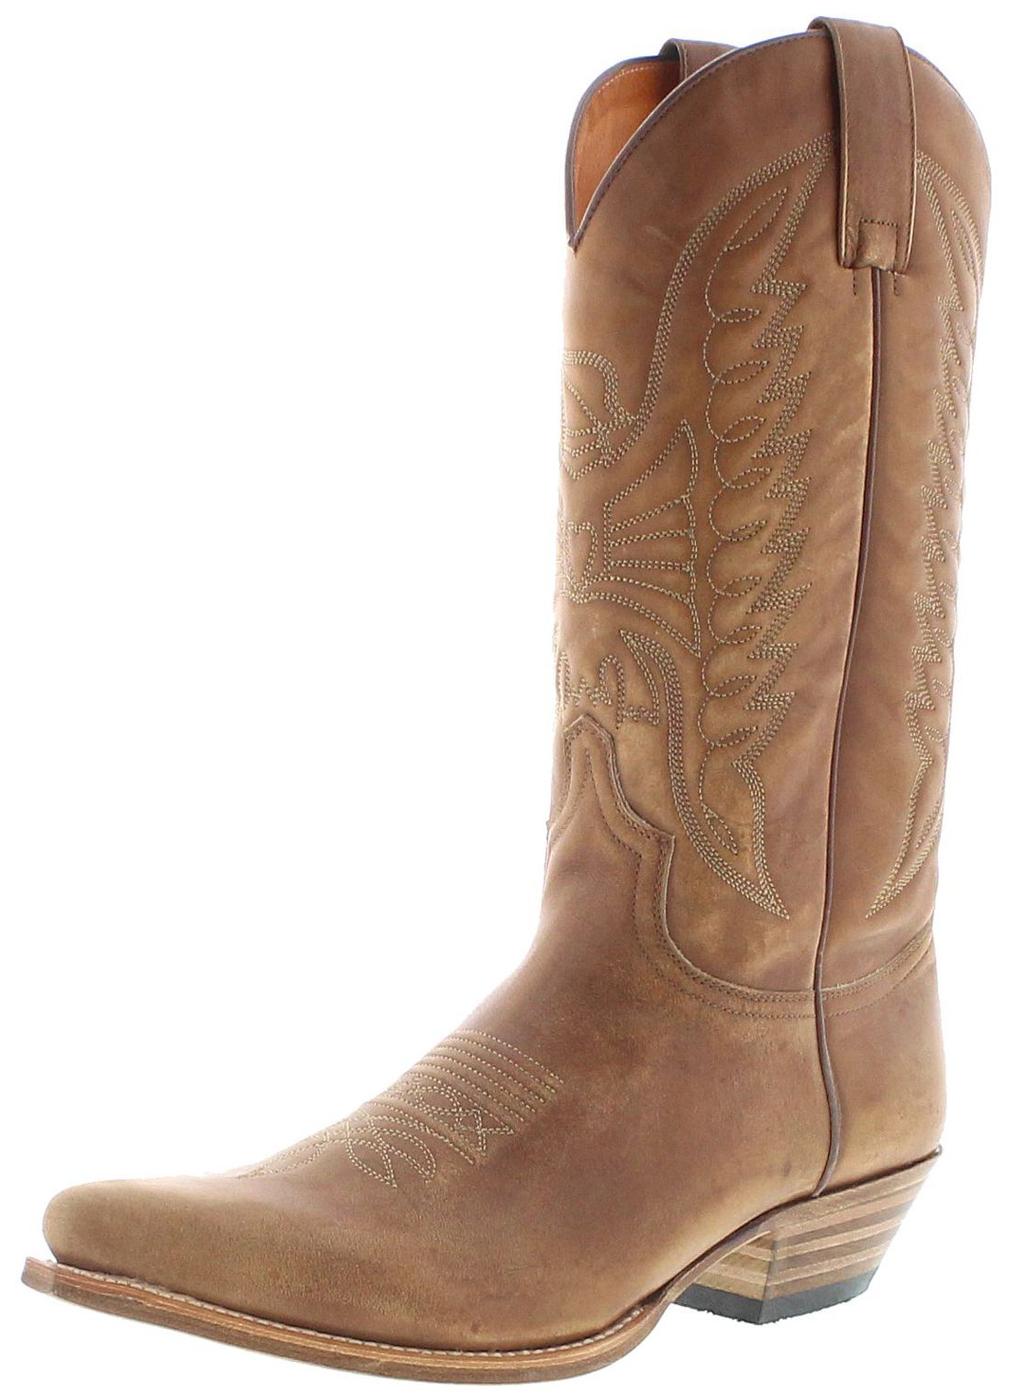 Sendra Boots 2073 Pico Lavado Western Boots - brown